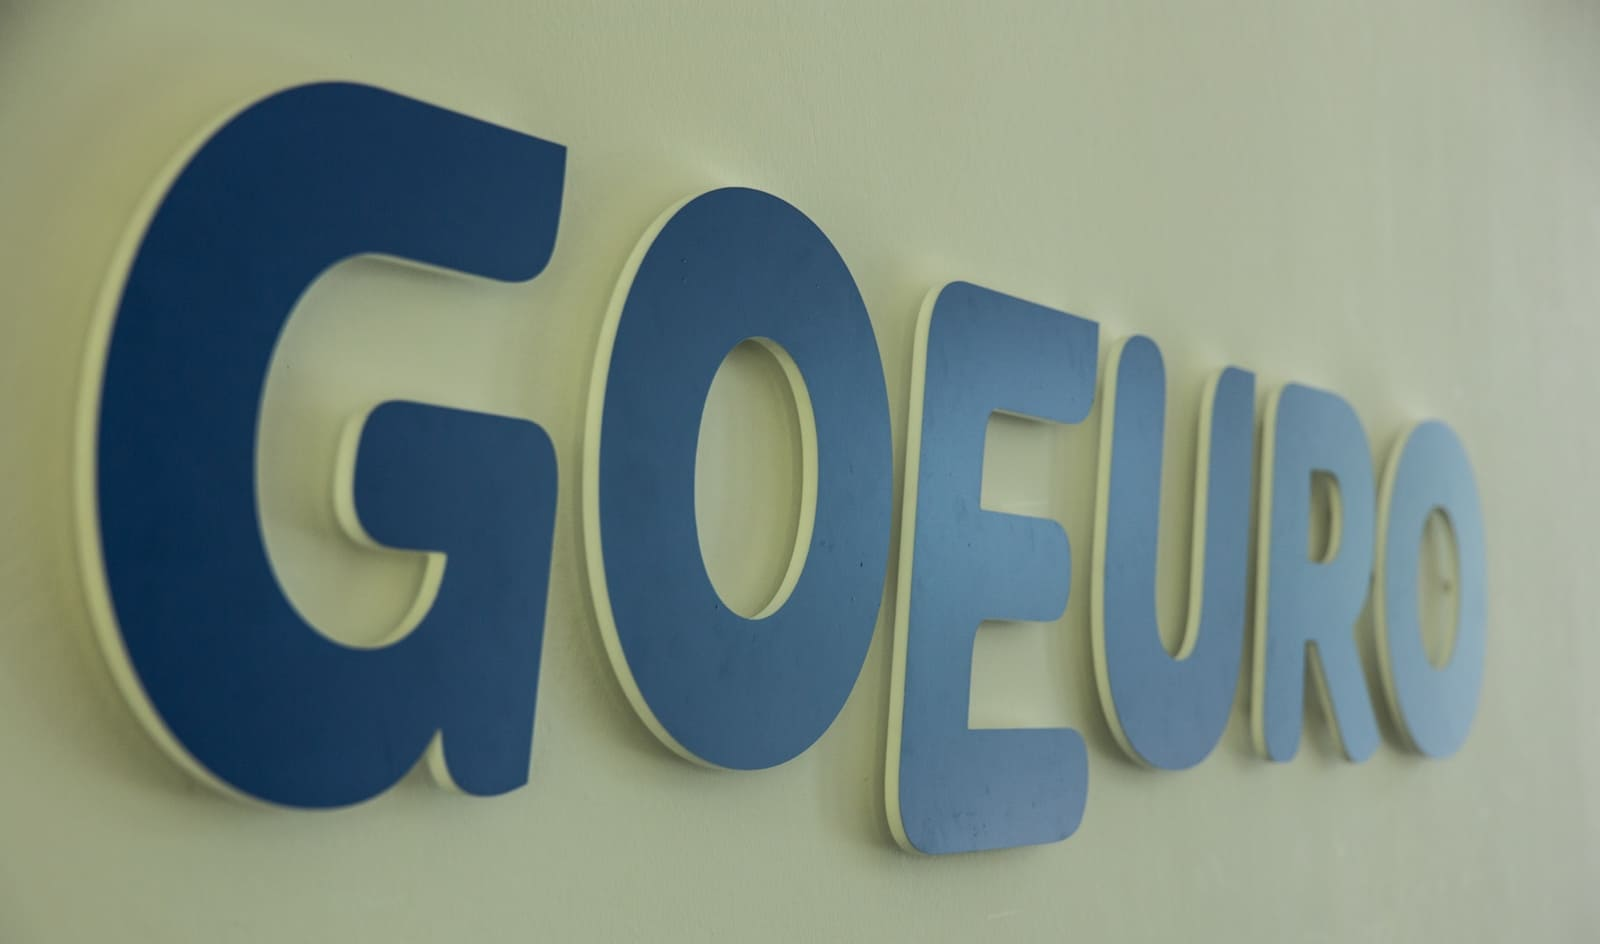 GoEuro - европейский онлайн-сервис по продаже билетов на поезд, самолёт, автобус